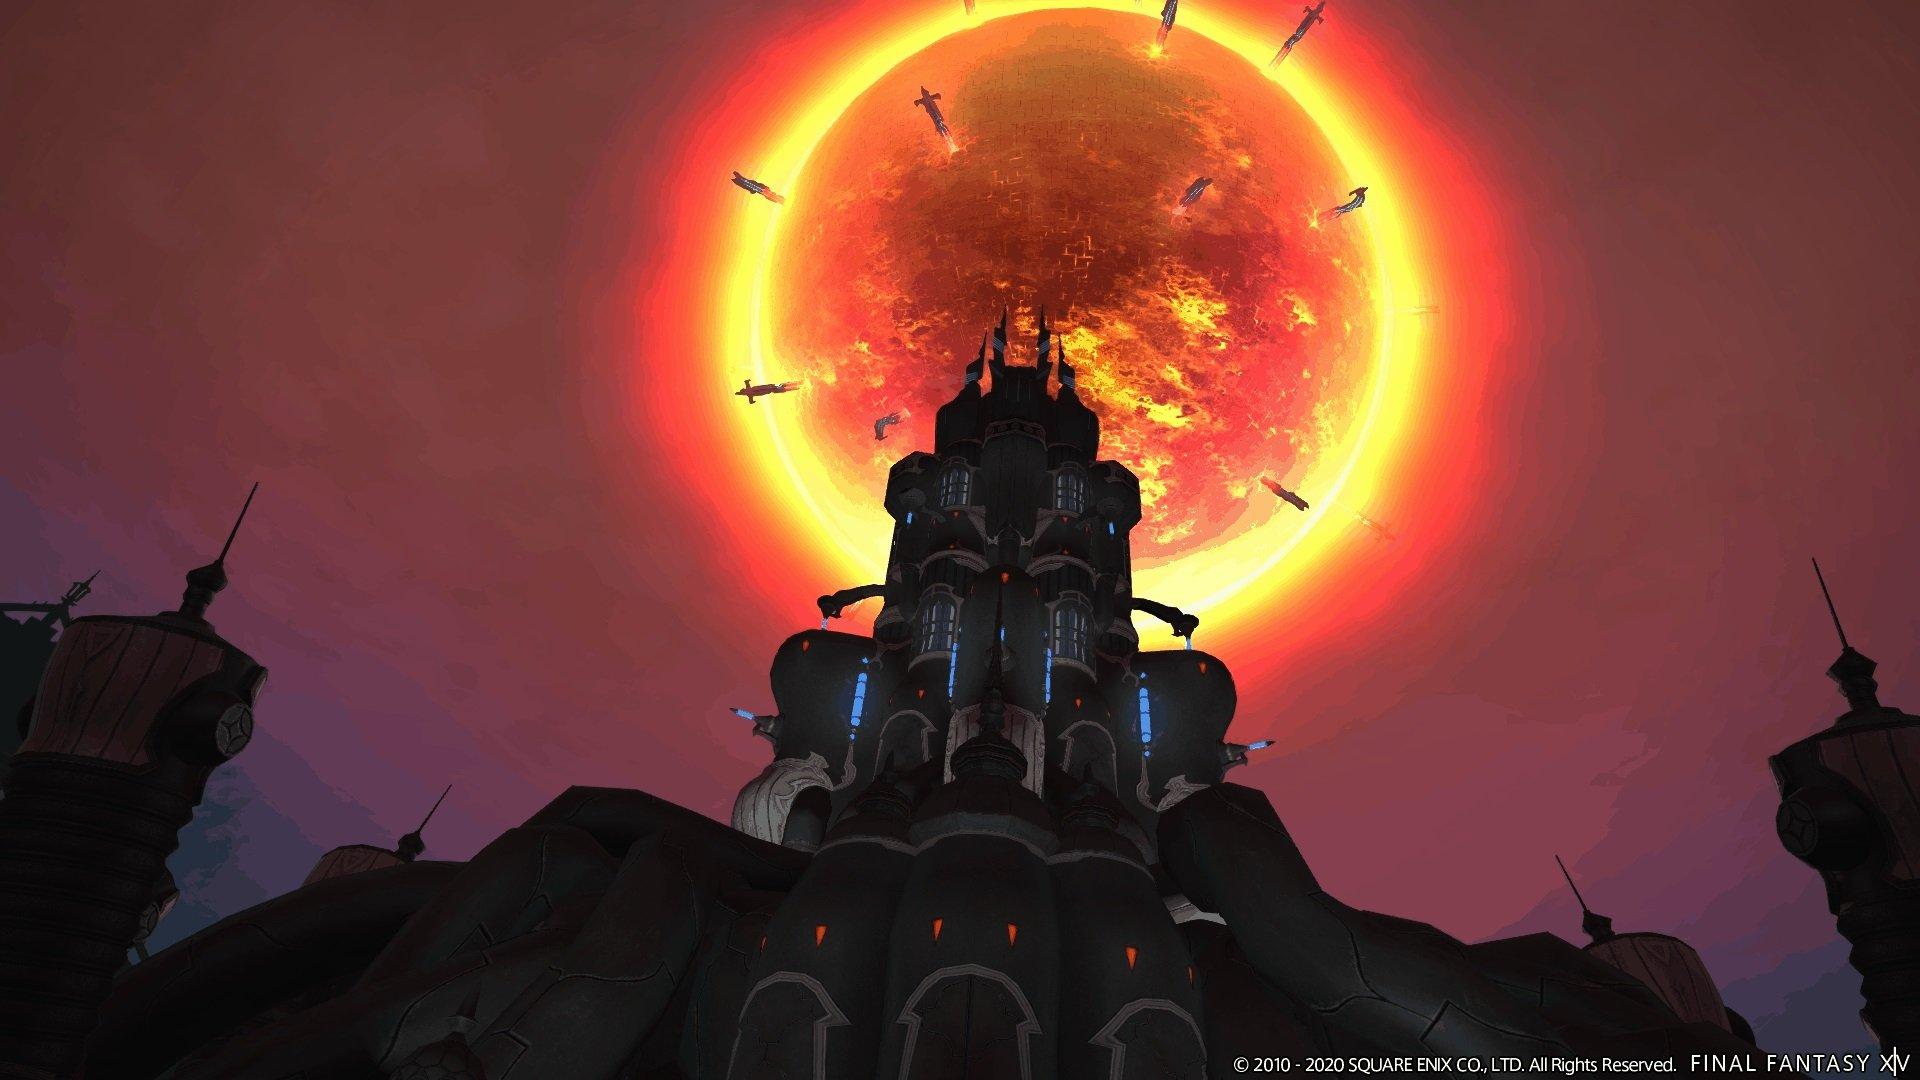 Final Fantasy XIV patch 5.25 Final Fantasy 14 patch 5.25